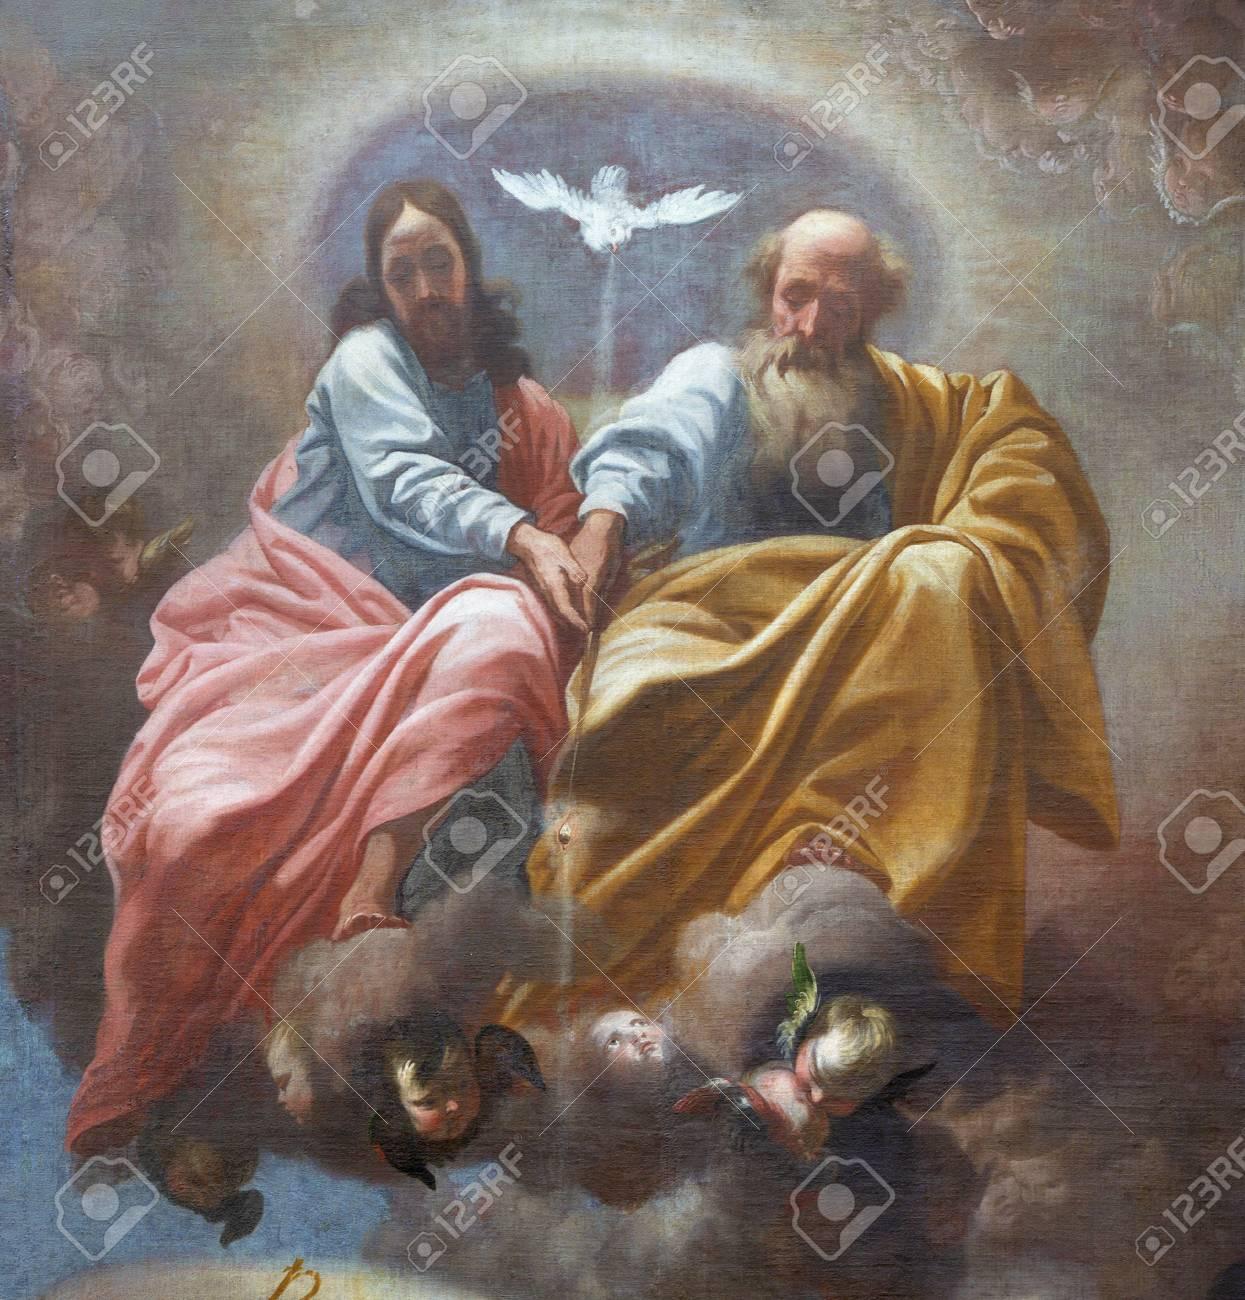 PRAGUE, CZECH REPUBLIC - OCTOBER 12, 2018: The baroque painting of Holy Trinity in church kostel Svatého Tomáše by Karel Škréta (1610 - 1674). - 117432189